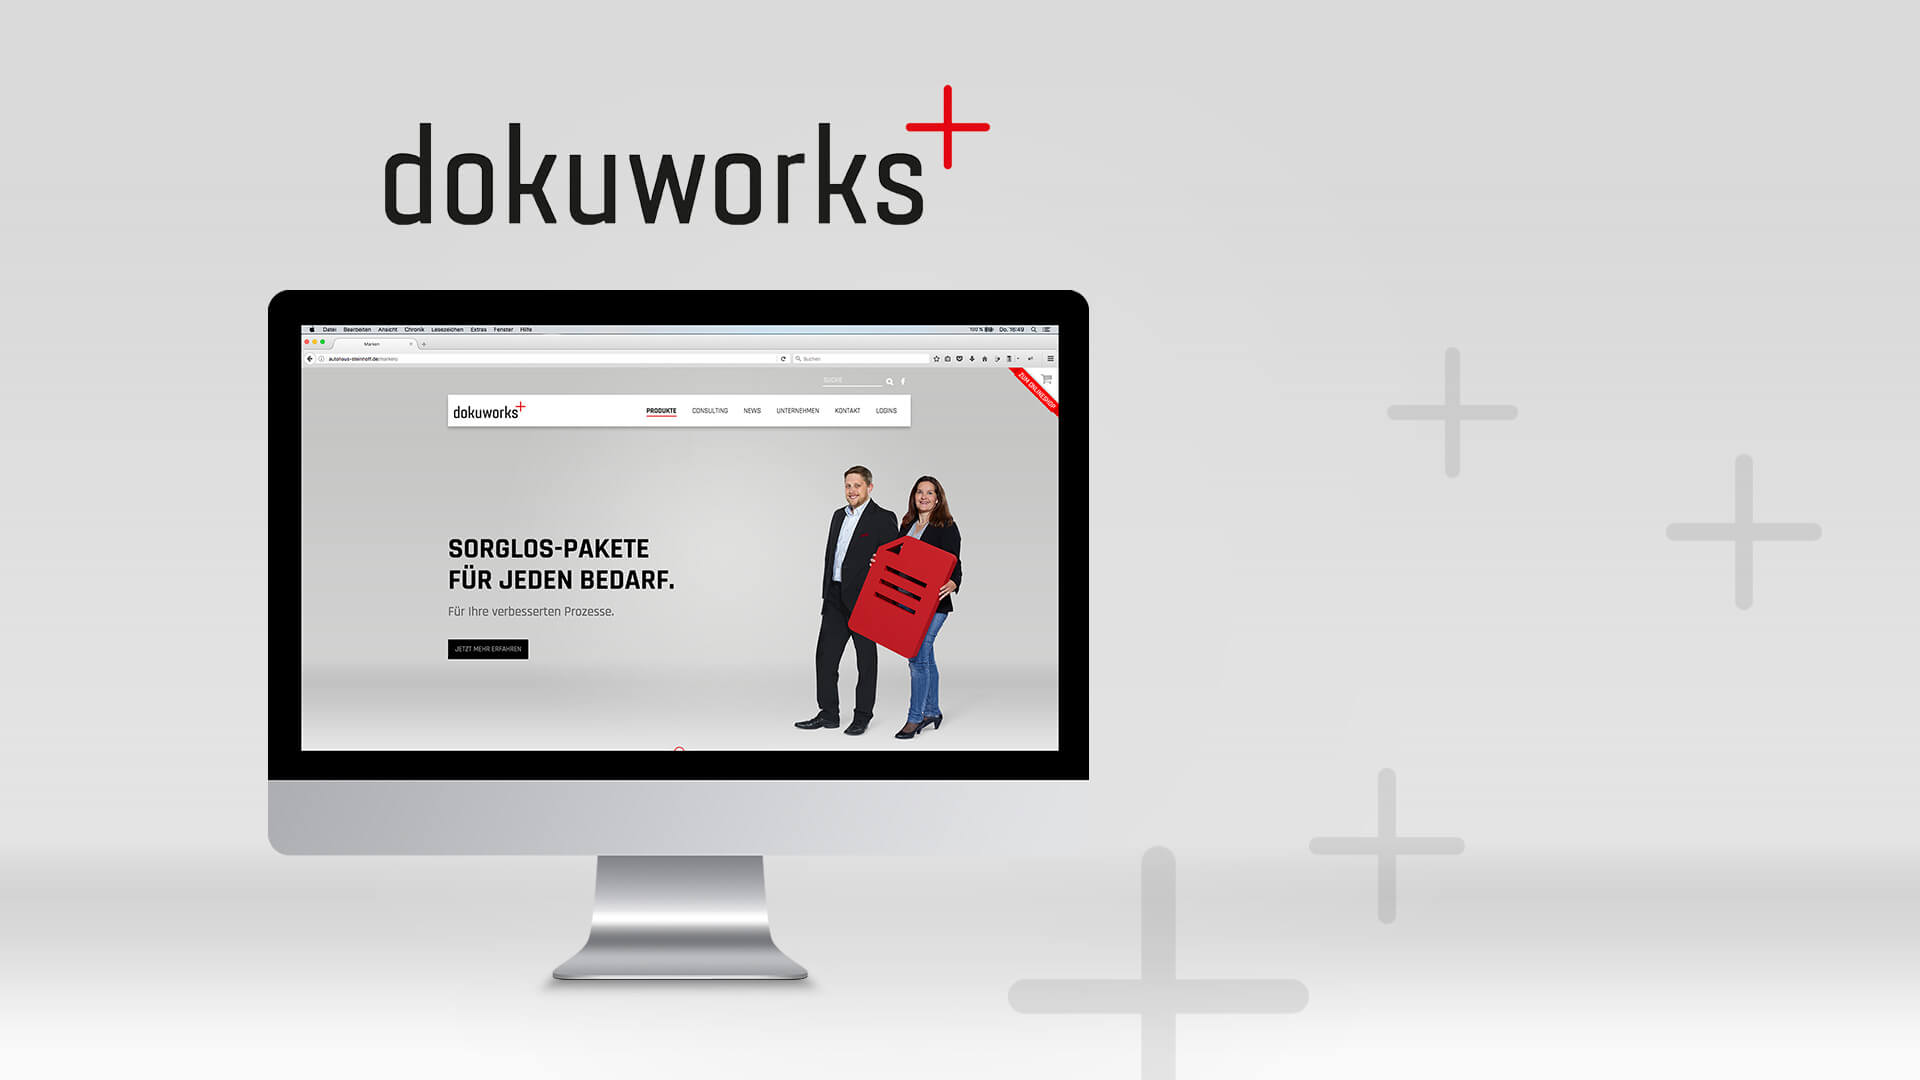 Referenz: dokuworks Websiterelauch Beitragsbild